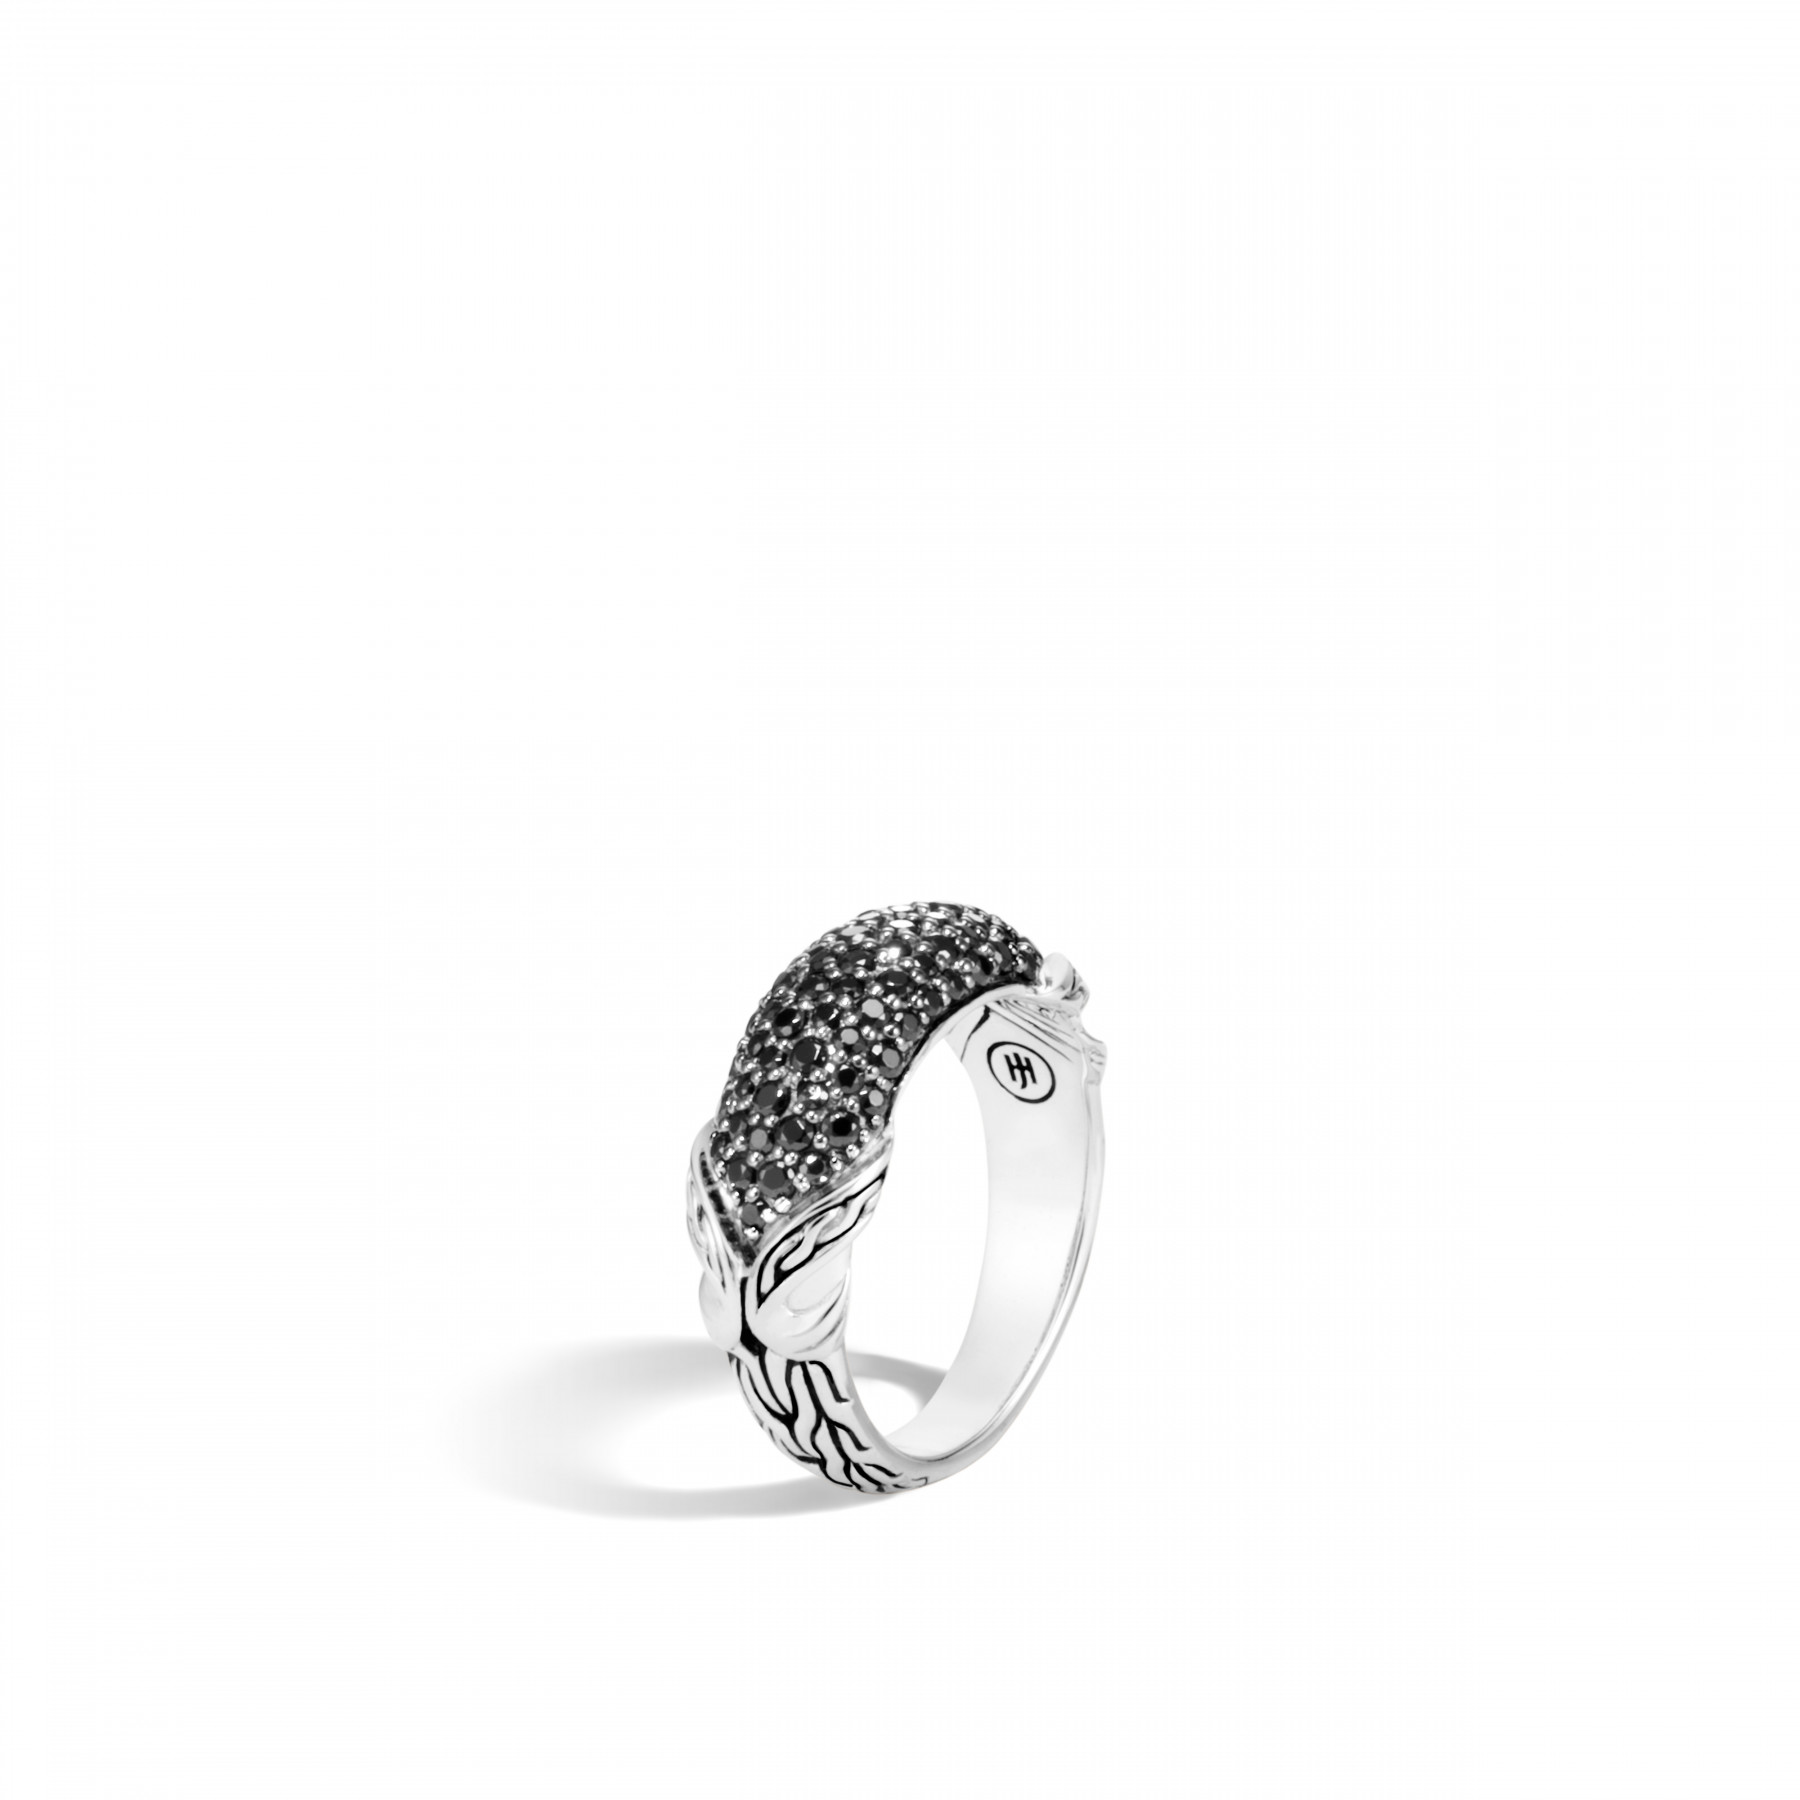 John Hardy Asli Classic Chain Silver and Black Gemstone Ring